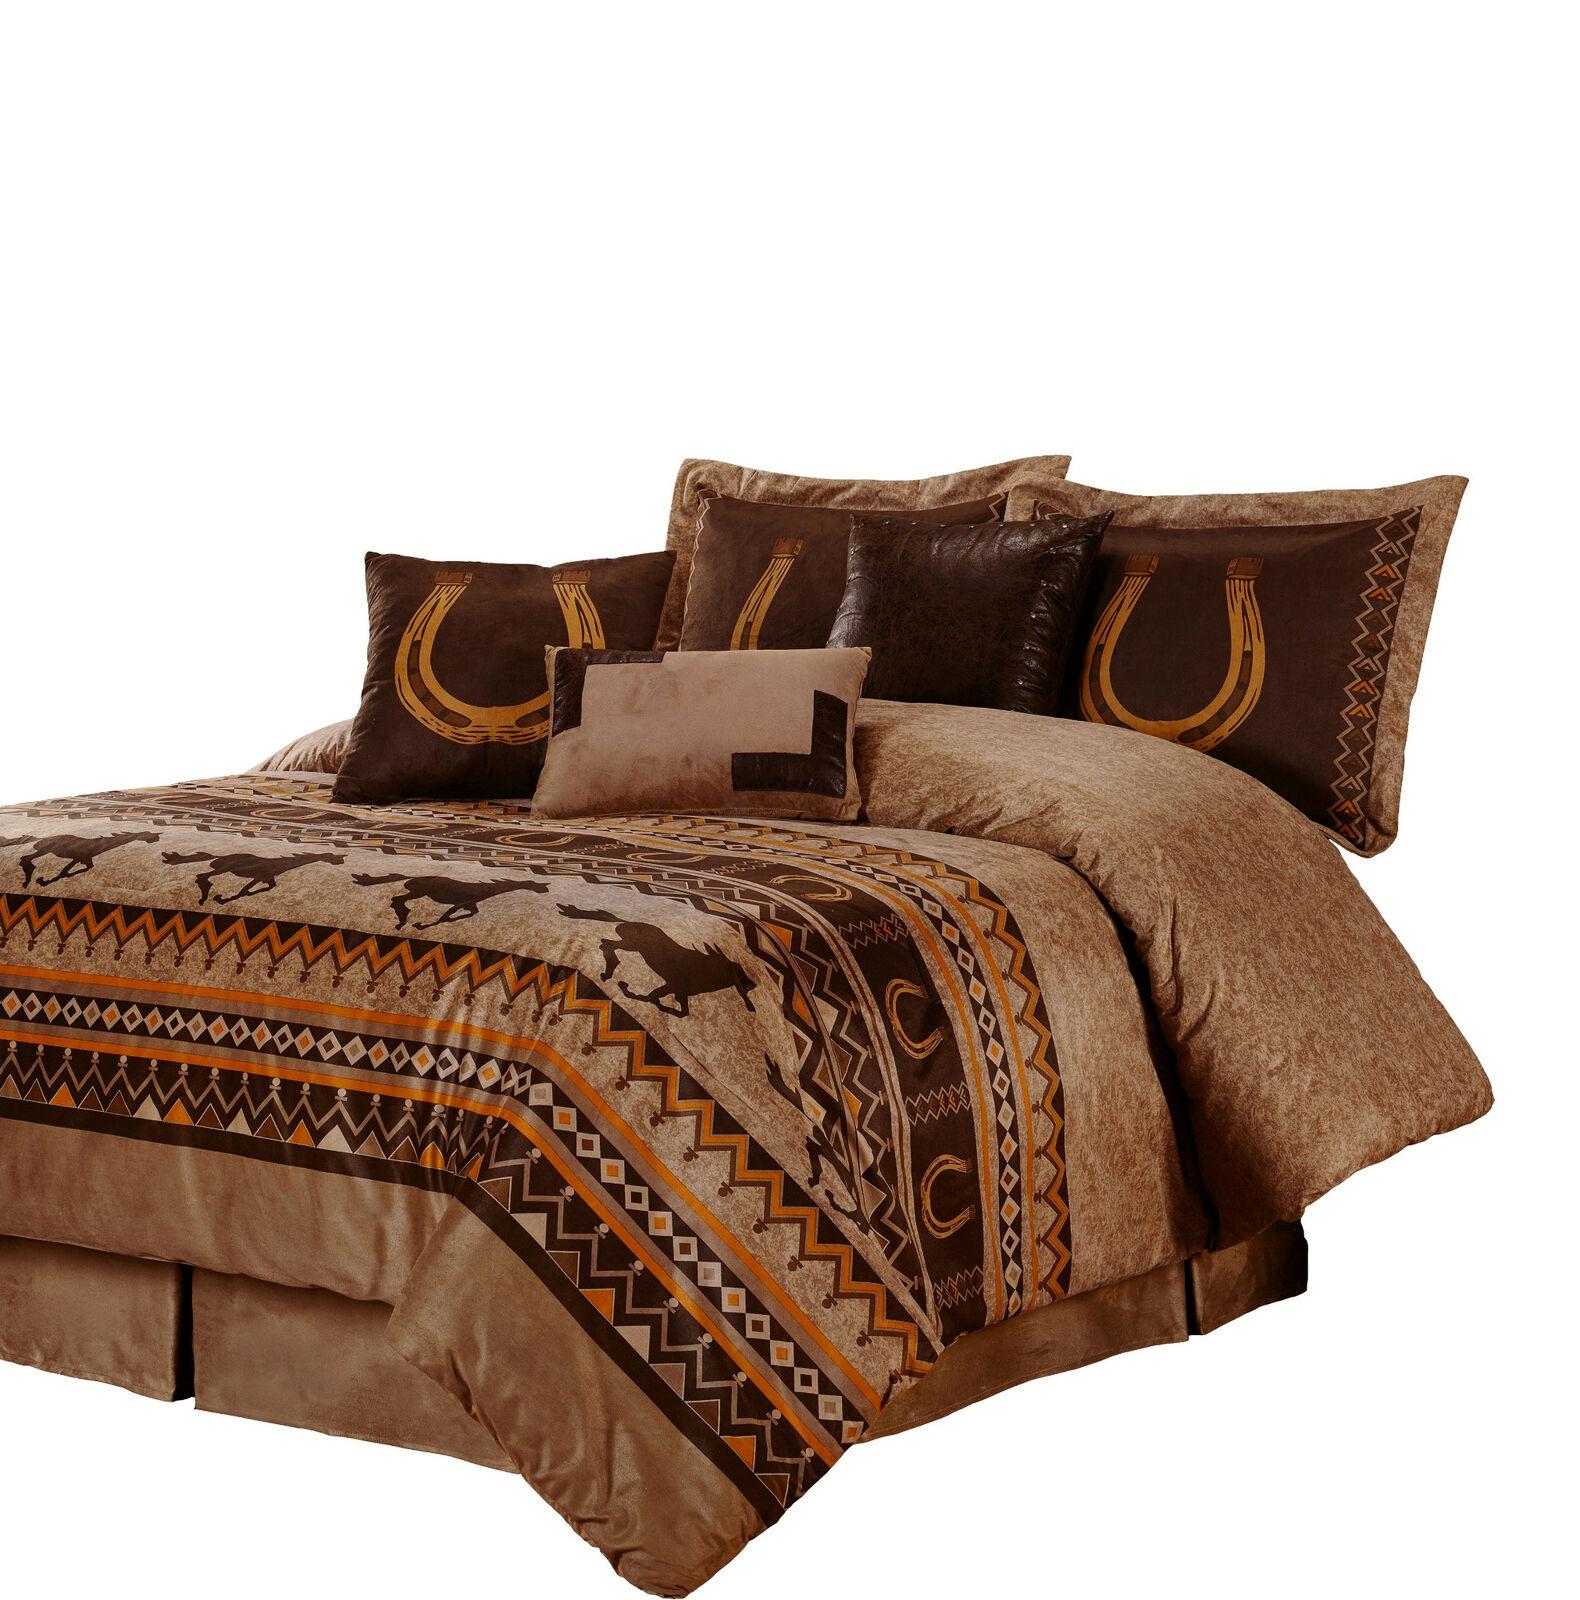 7pcs Southwestern Cabin Lodge Wild Horses Microsuede Marronee Comforter Set, King